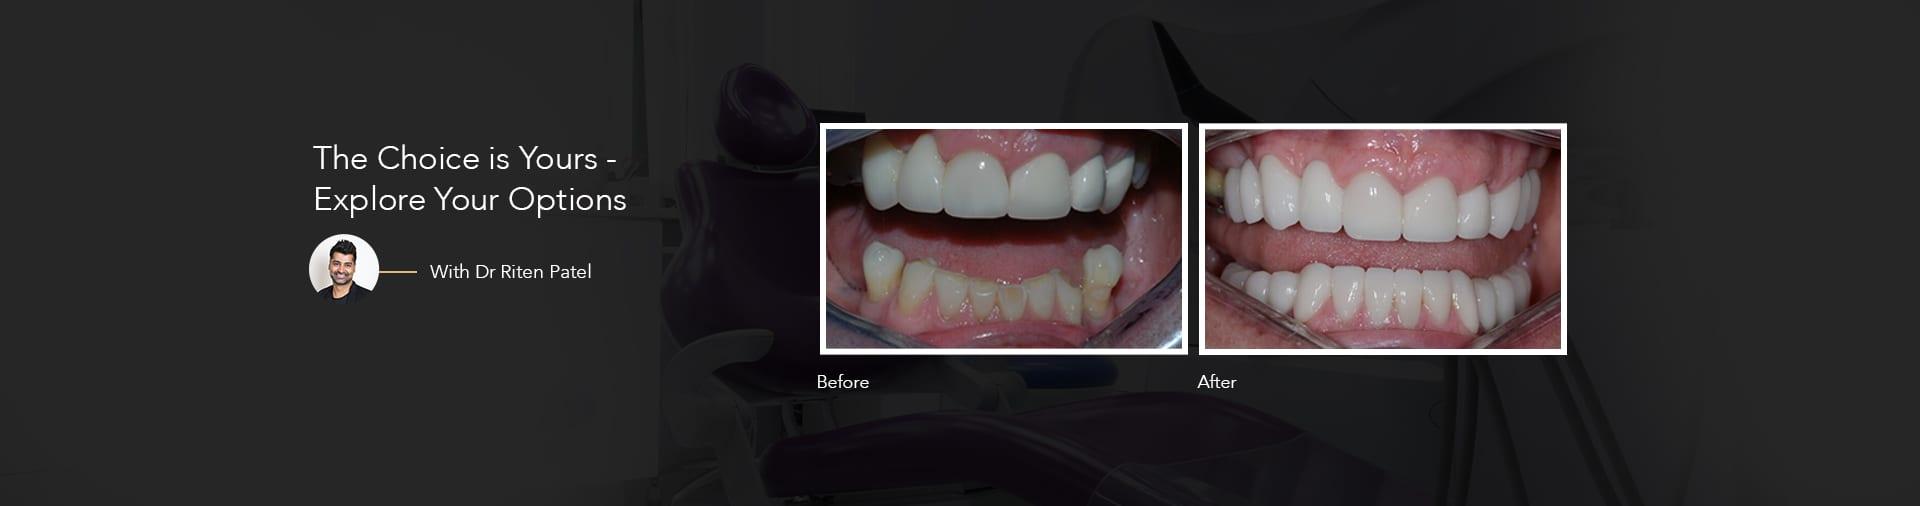 Dental Treatments in Surrey - Implants, Dentures & Endodontic